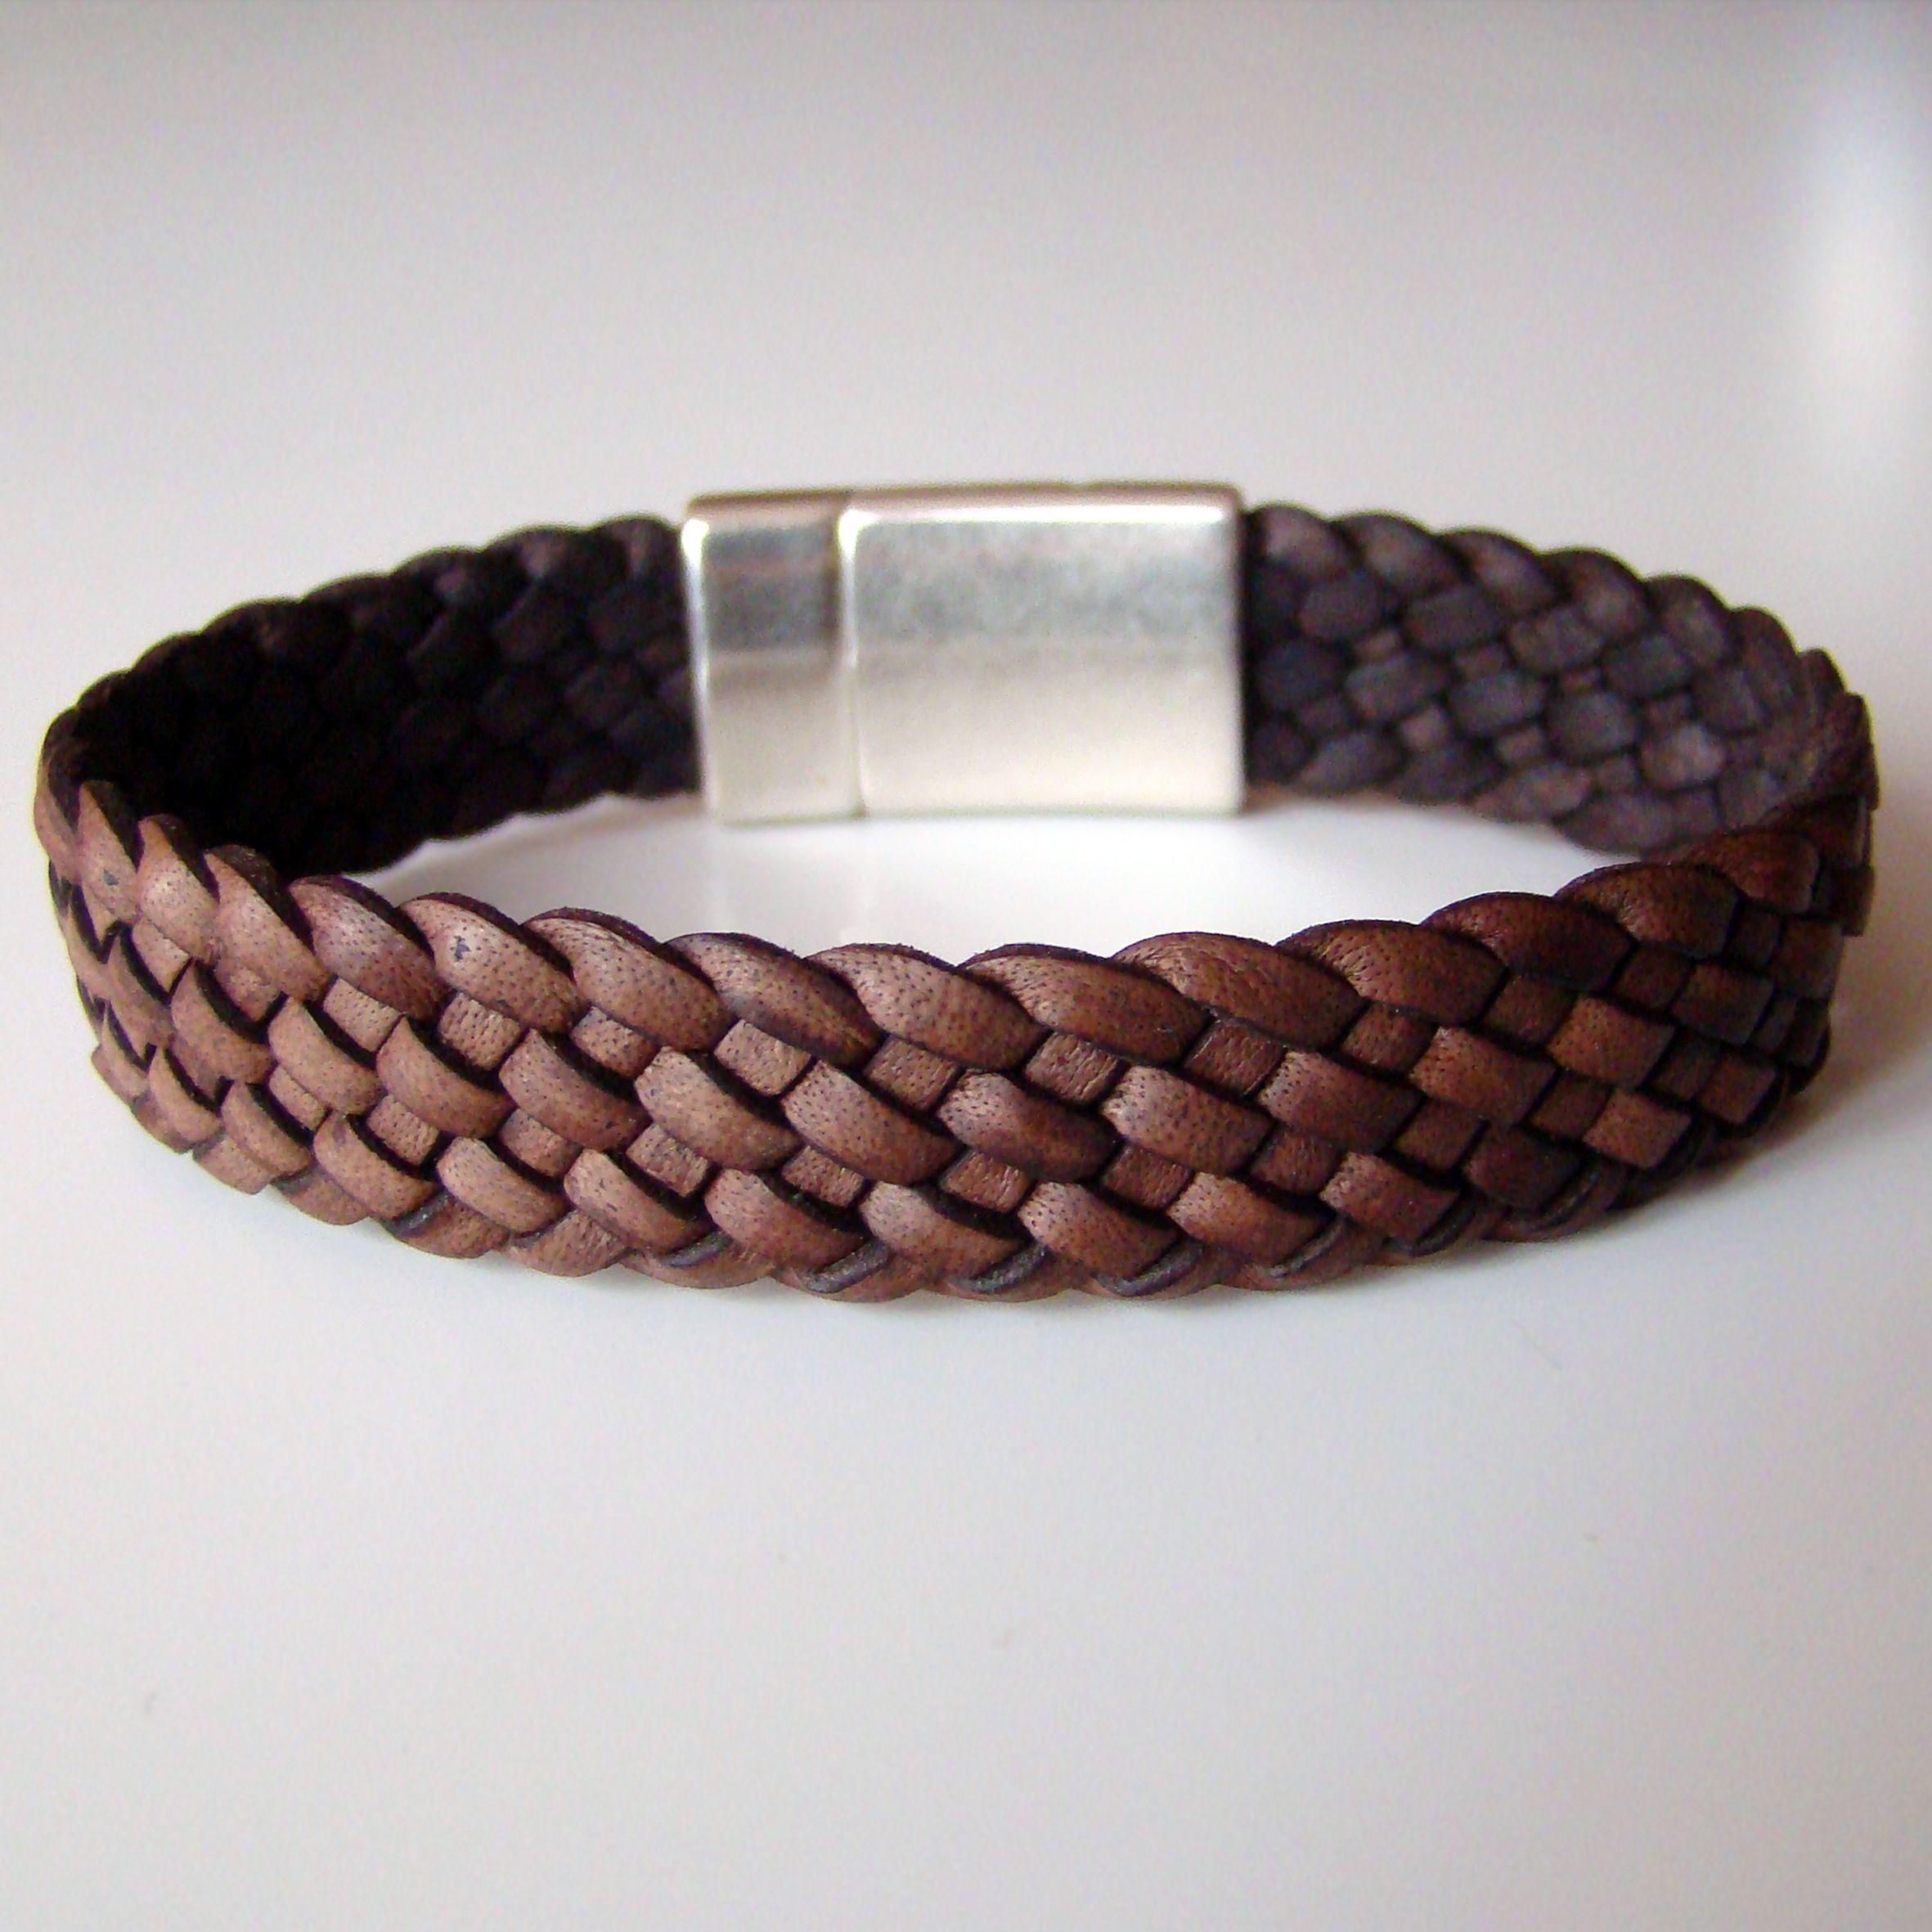 bracelet dandy damier marron antique tress 7 brins fermoir magn tique plaqu argent. Black Bedroom Furniture Sets. Home Design Ideas